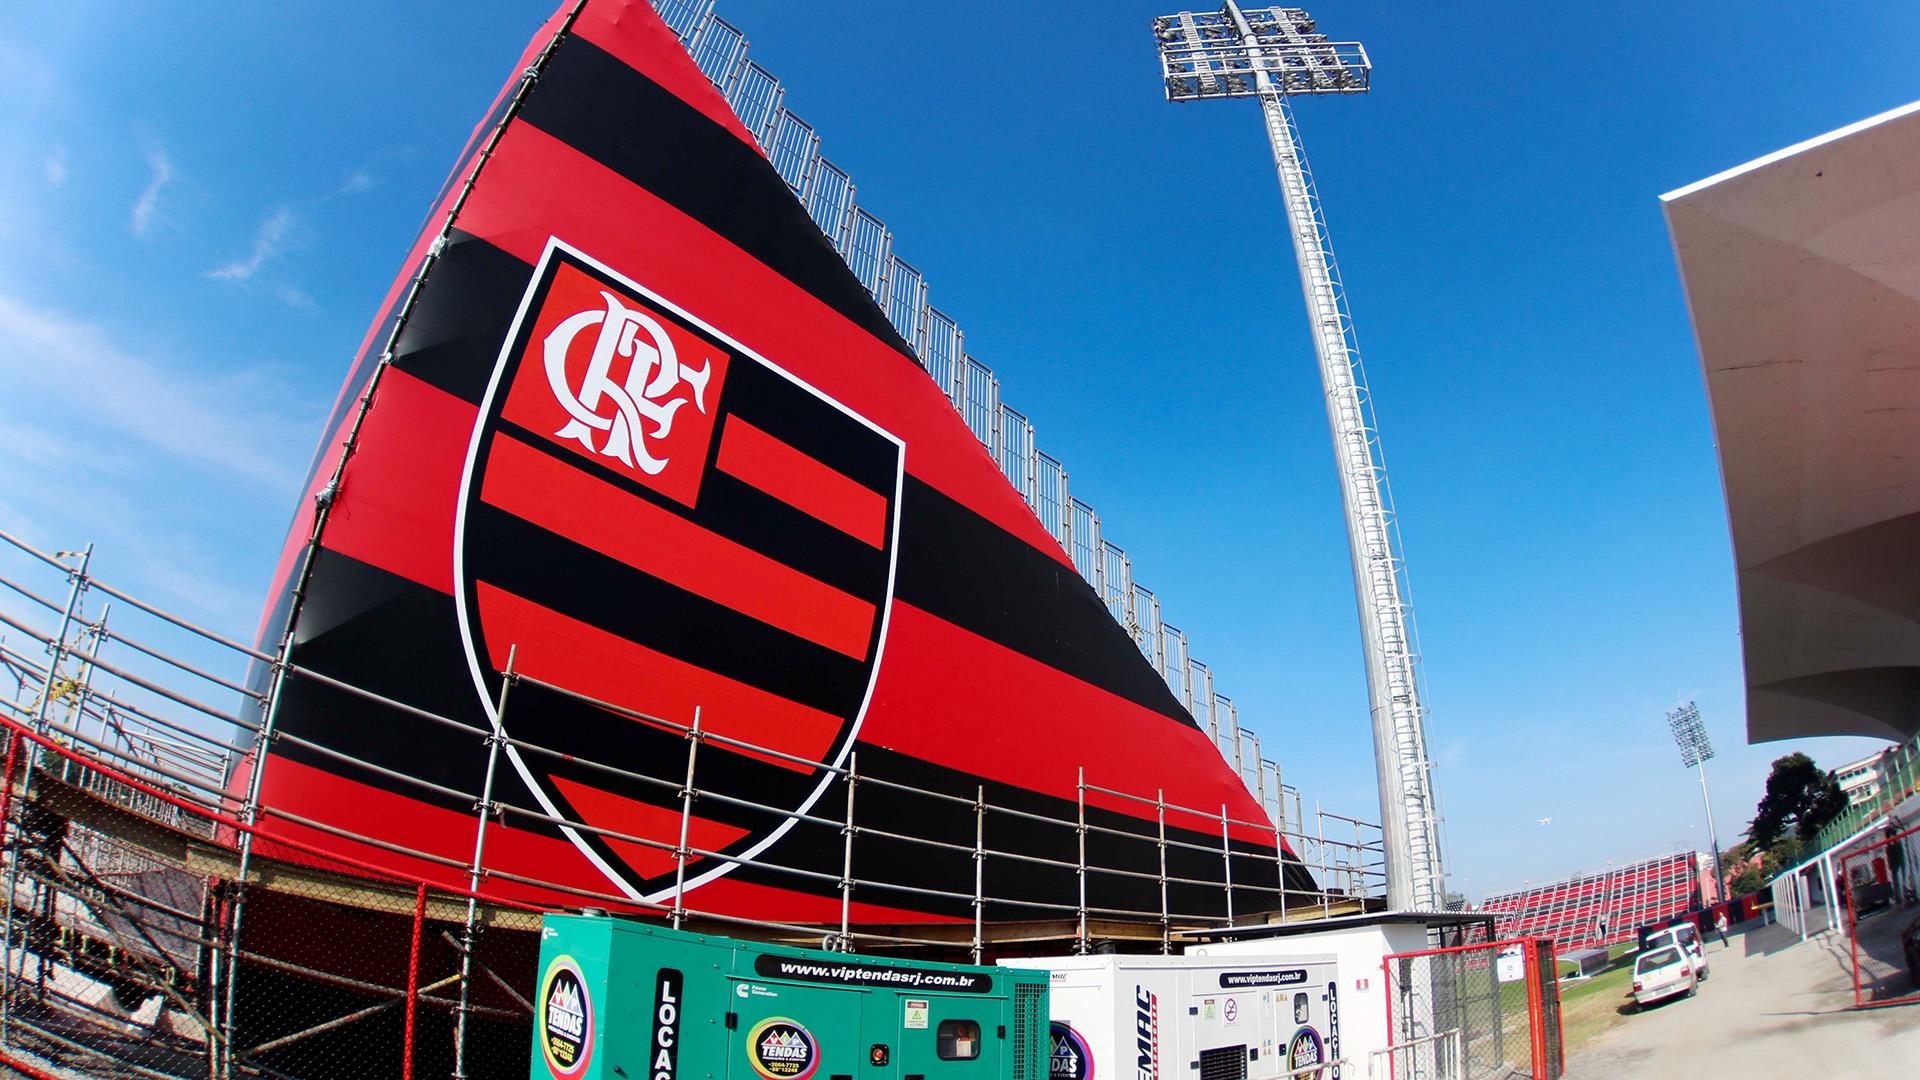 Flamengo Ilha do Urubu 2017